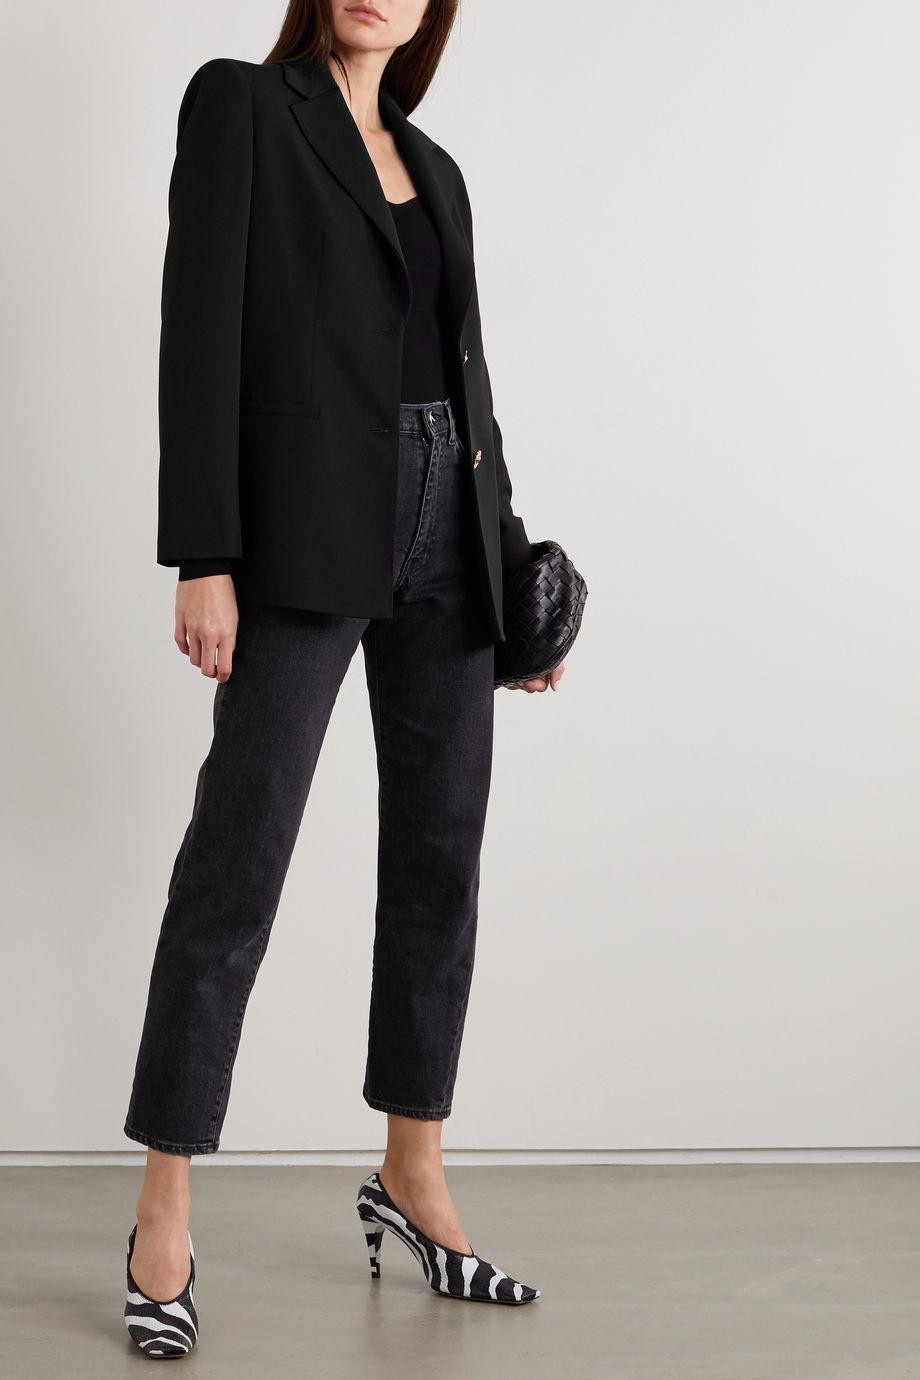 Versace Wool-blend grain de poudre blazer